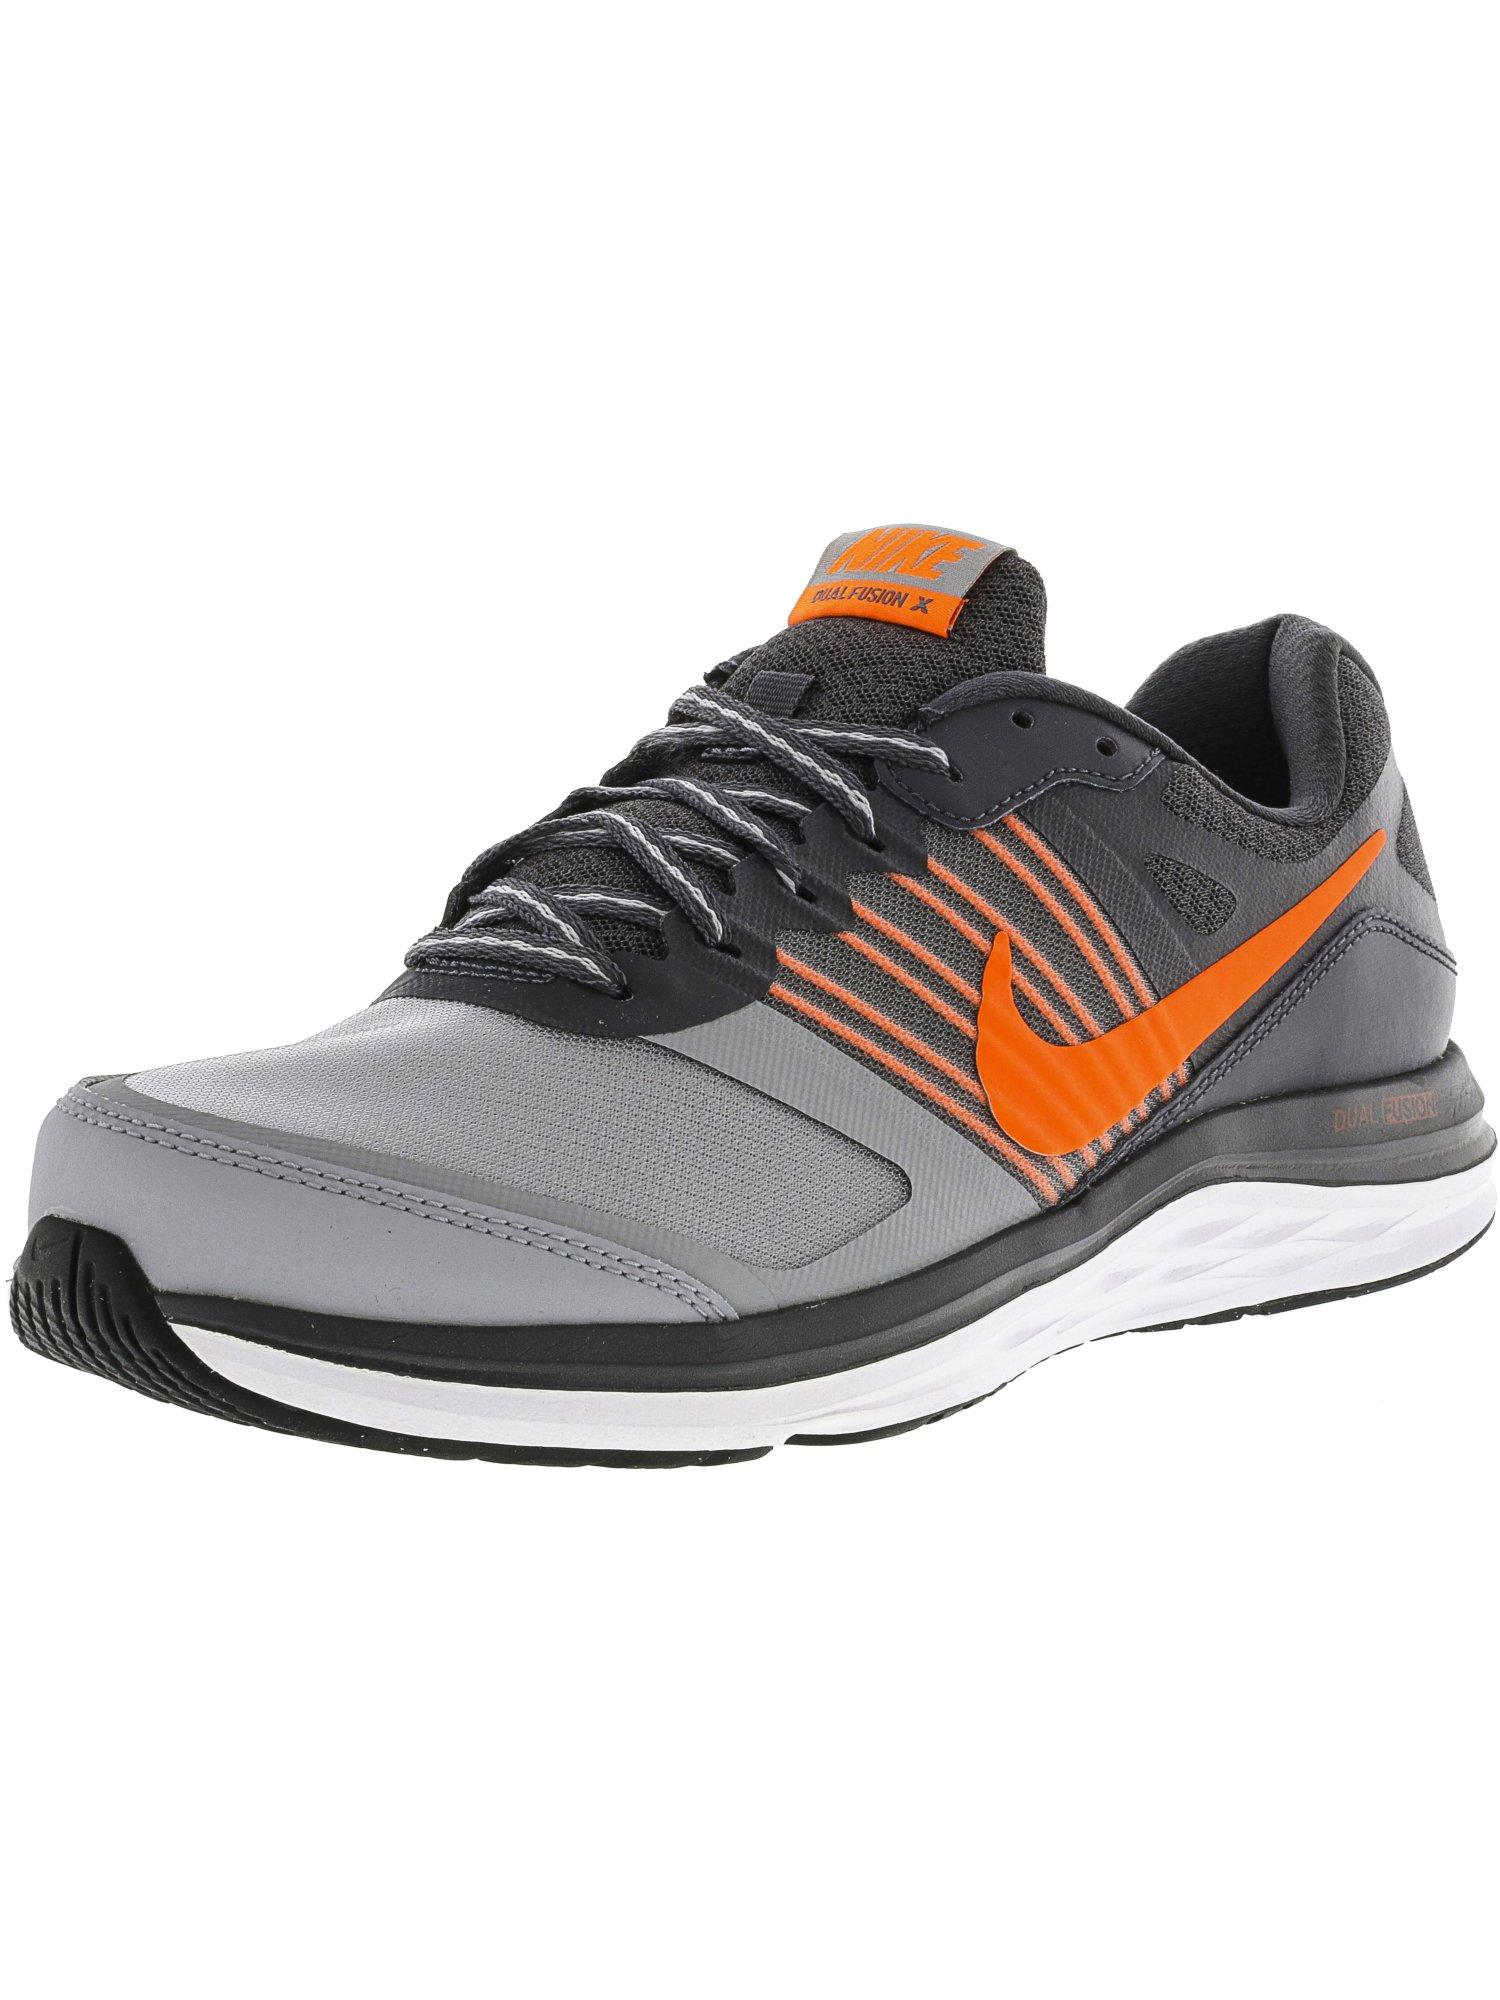 Nike-Men-039-s-Dual-Fusion-X-Ankle-